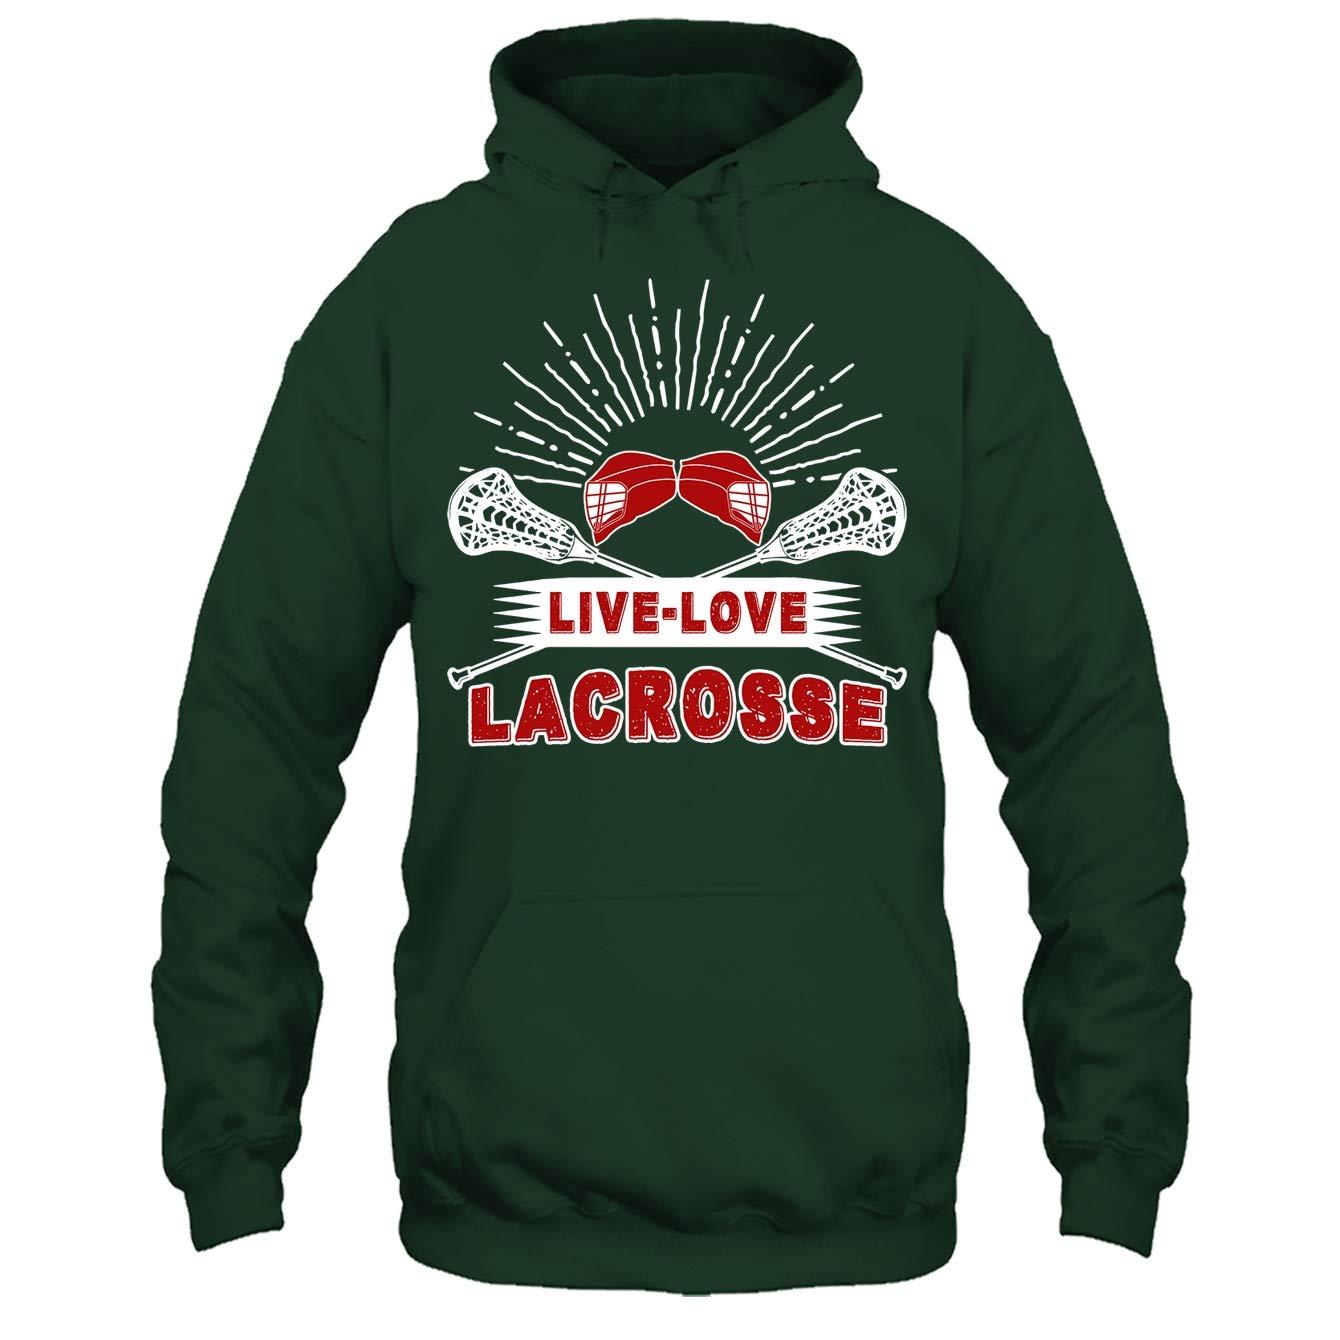 Lacrosse Cool Tee Shirt Live Love Lacrosse Tshirt